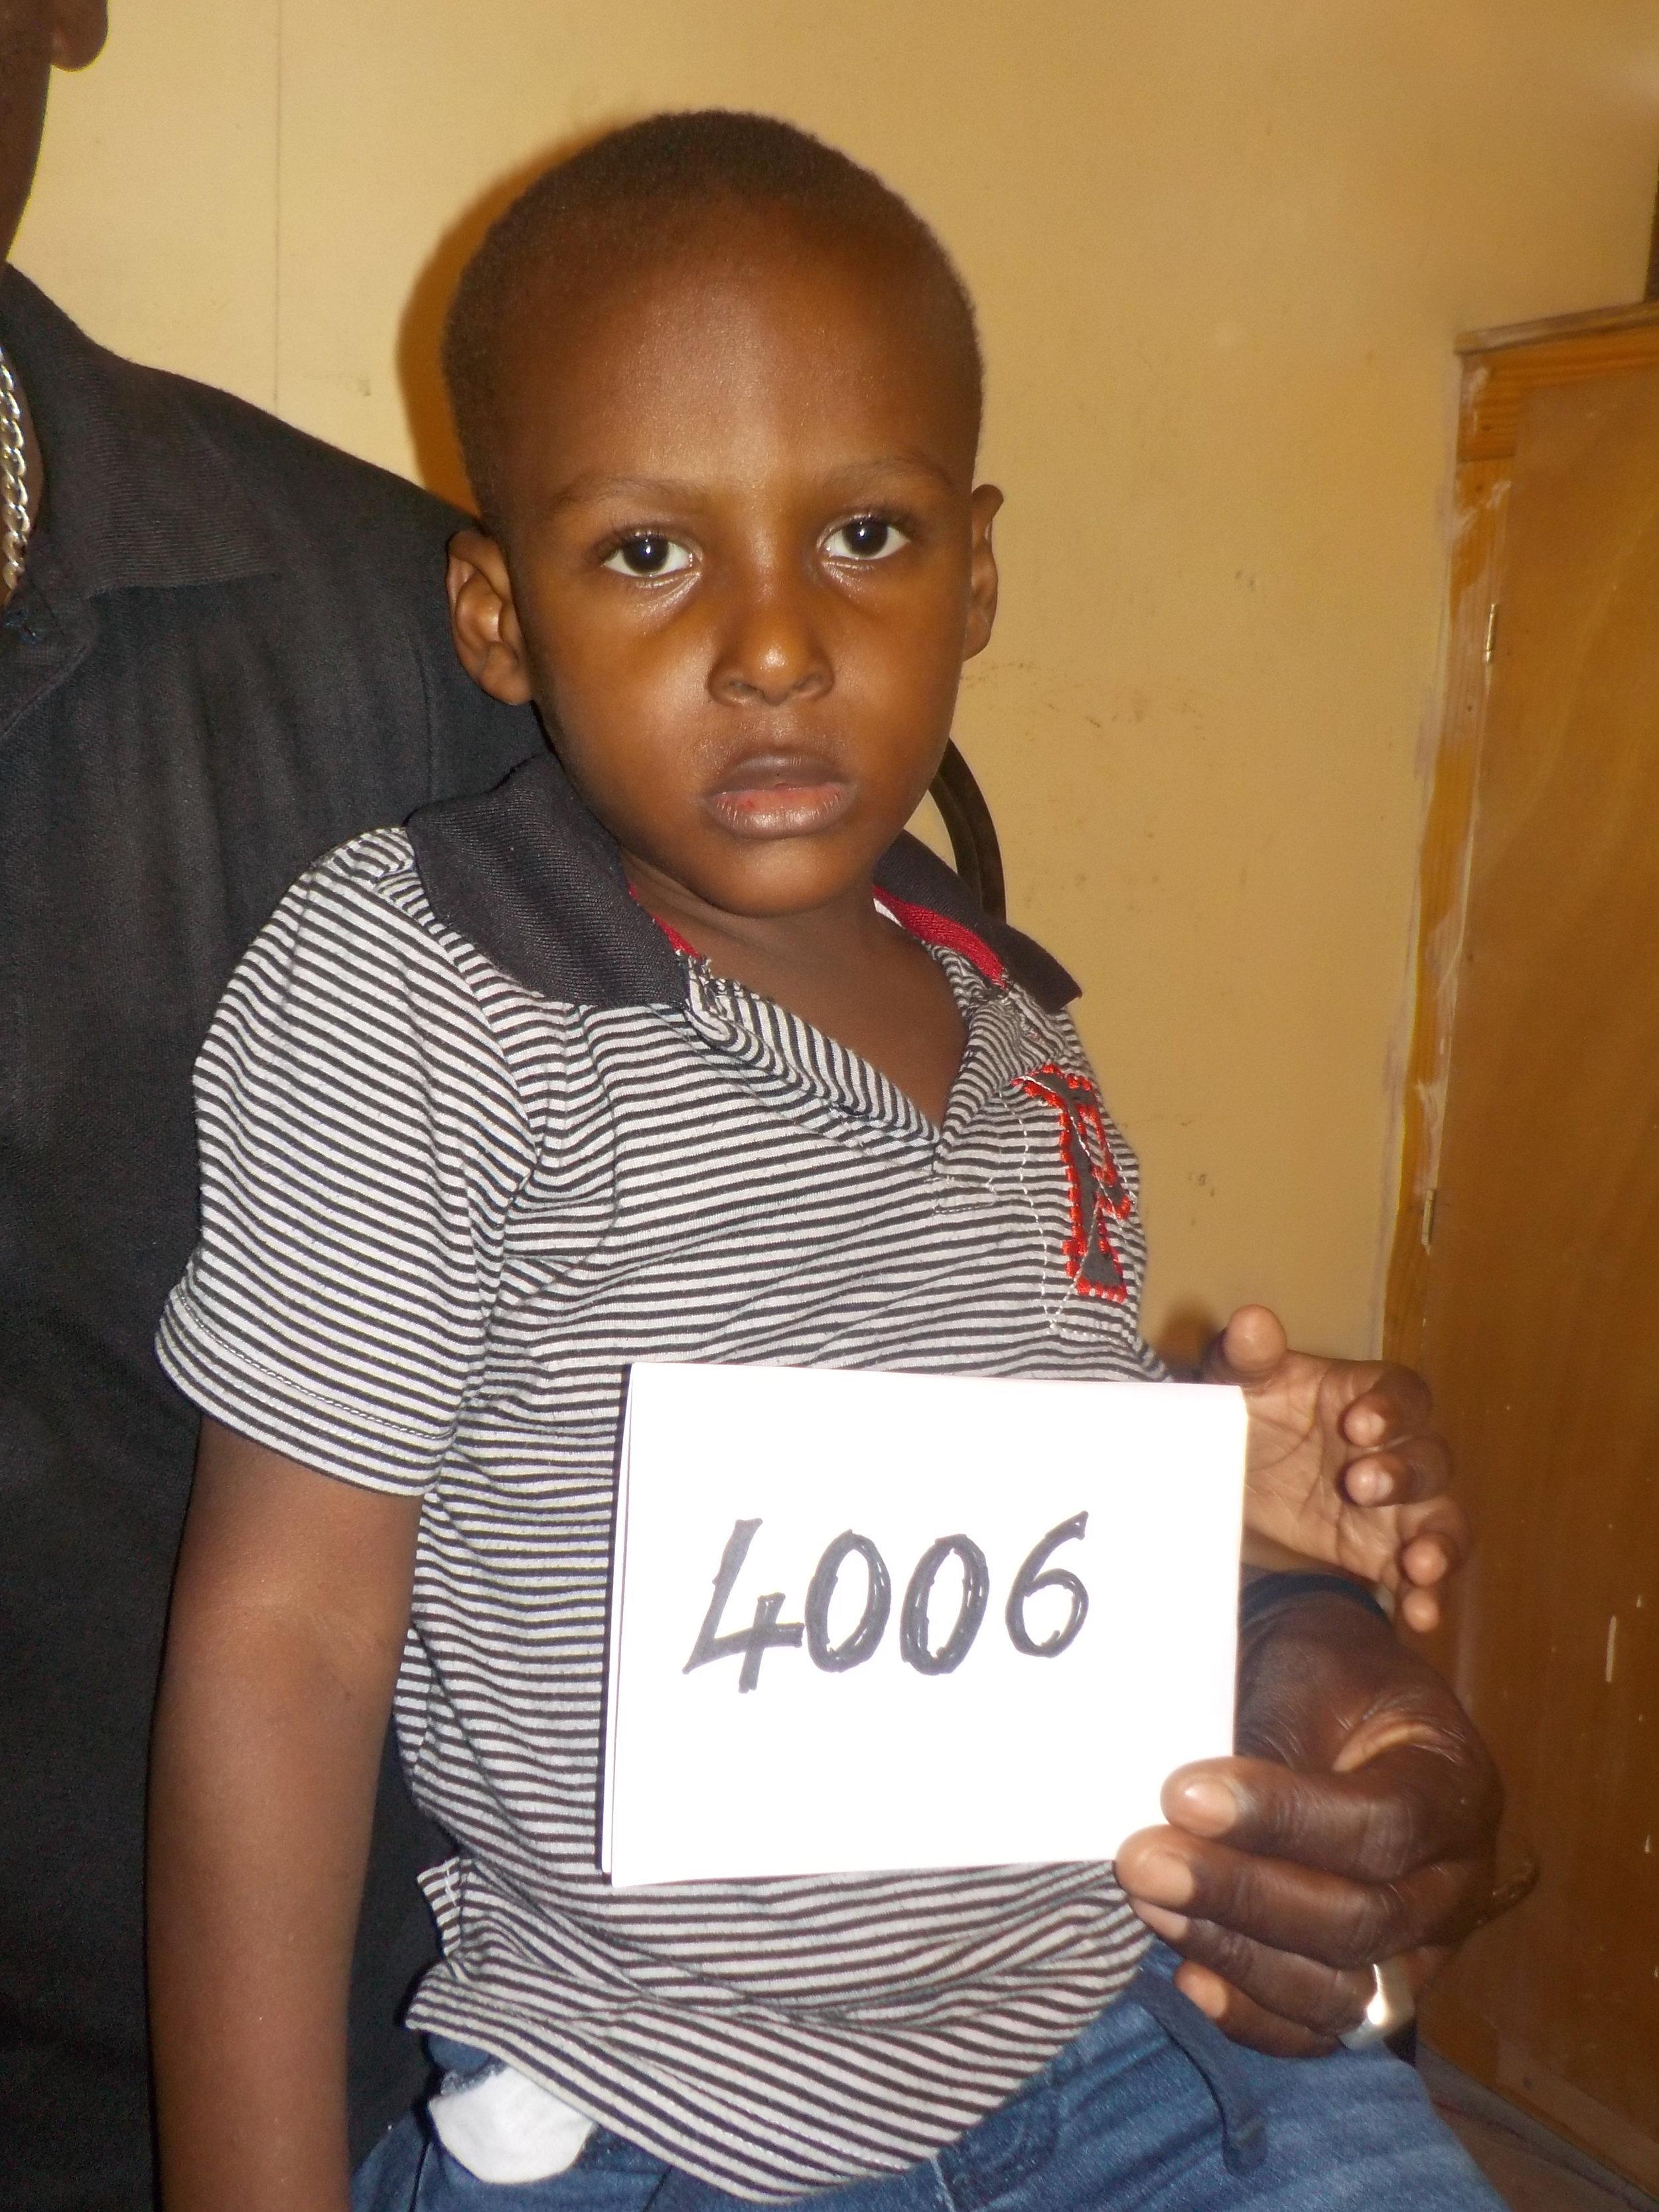 4006 Loveson Louissaint.JPG